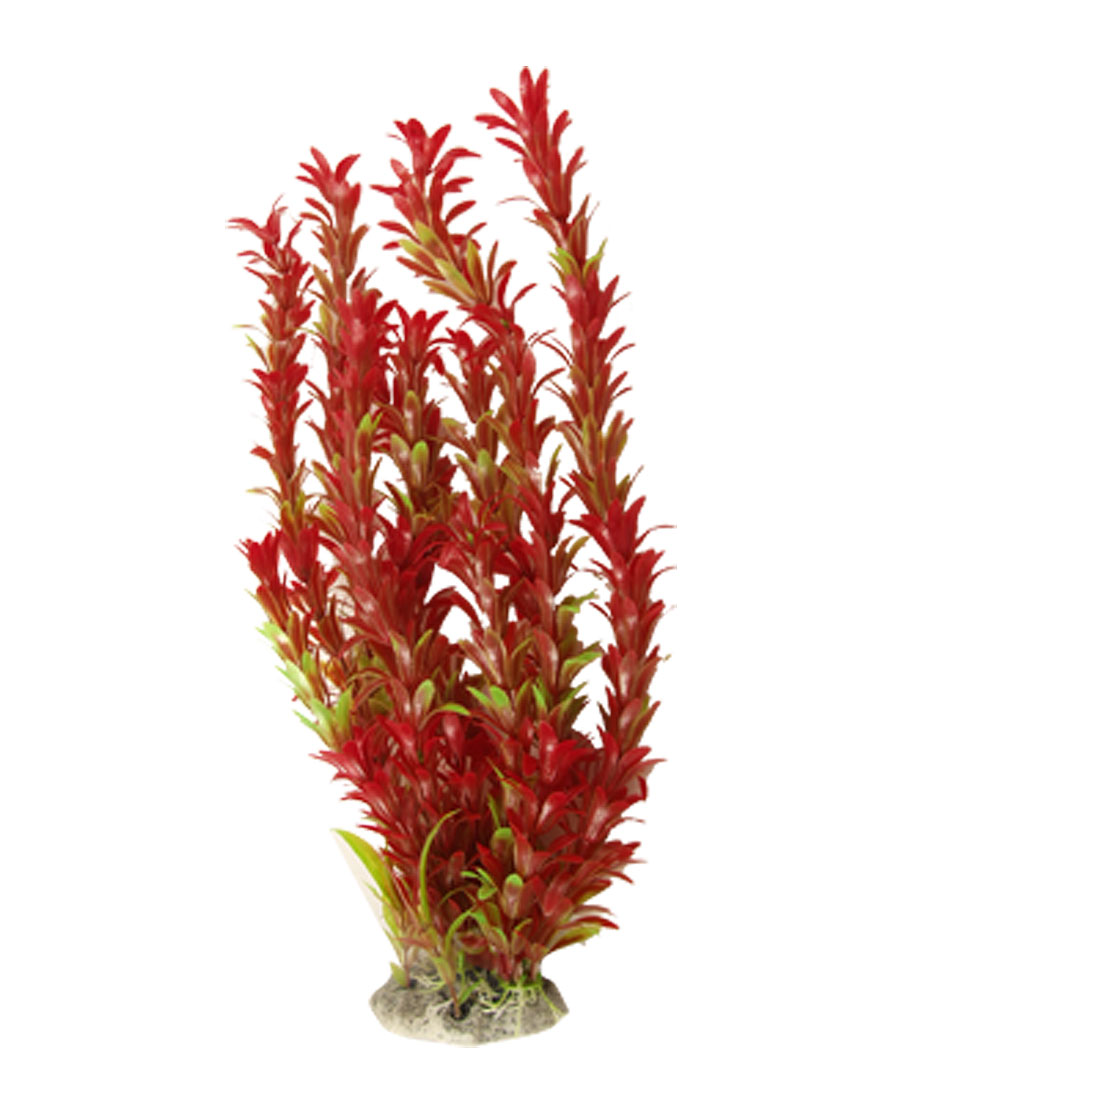 "Burgundy Long Leaves 17"" High Plastic Plant Ornament for Aquarium"